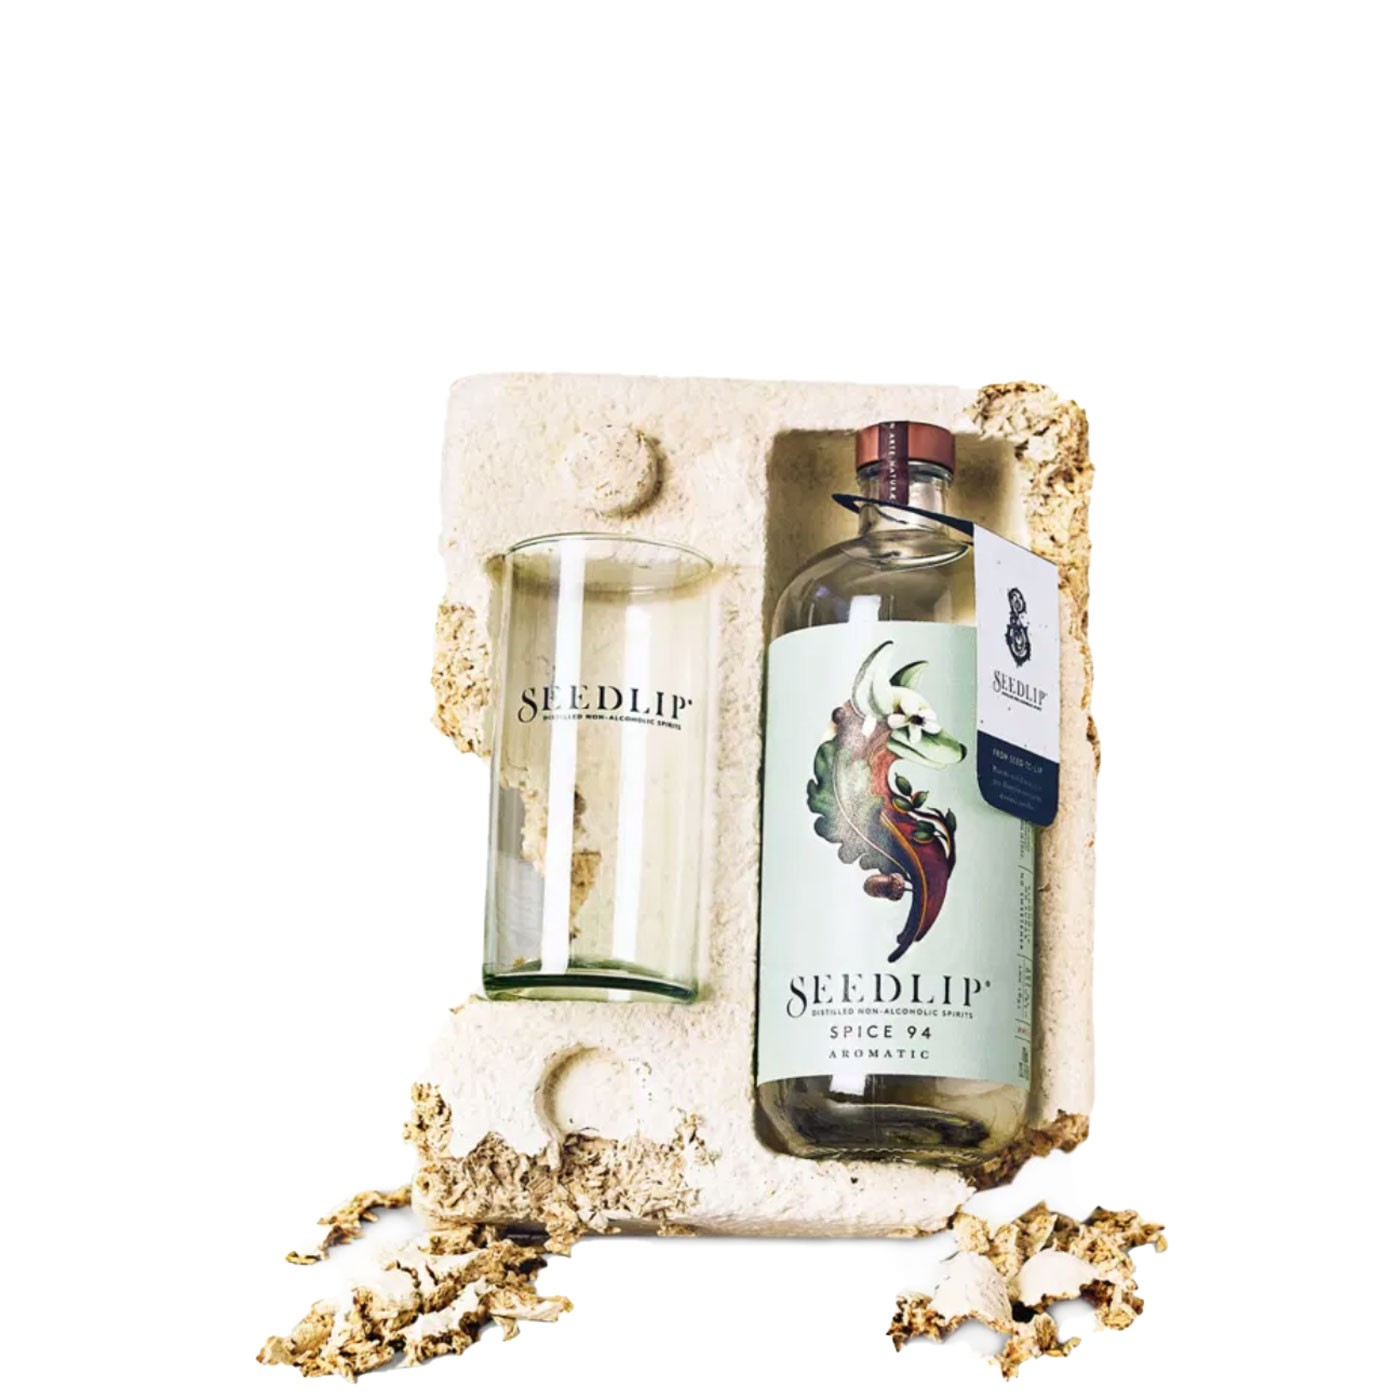 Mycelium Seedlip Spice 94 Gift Set